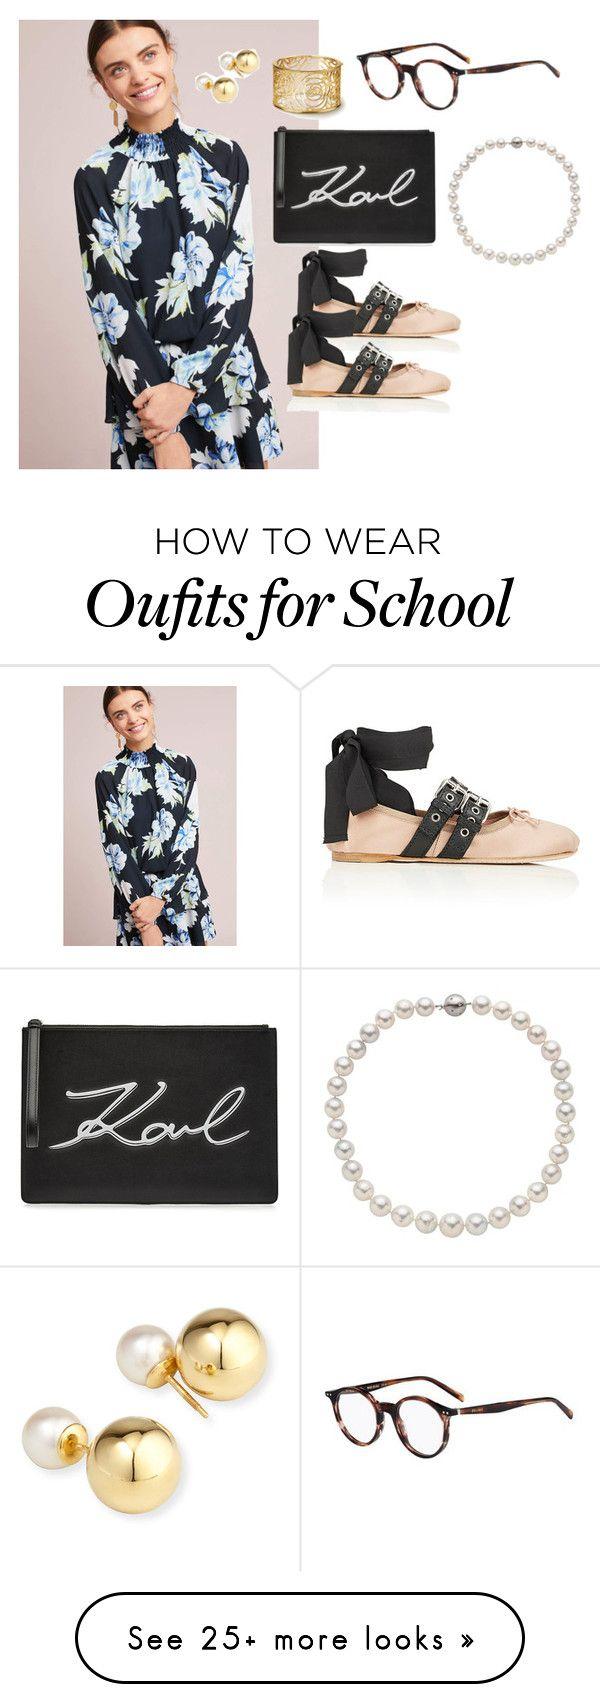 """School Dinner"" by design360 on Polyvore featuring Yumi Kim, Miu Miu, Karl Lagerfeld, CÉLINE and Yoko London"